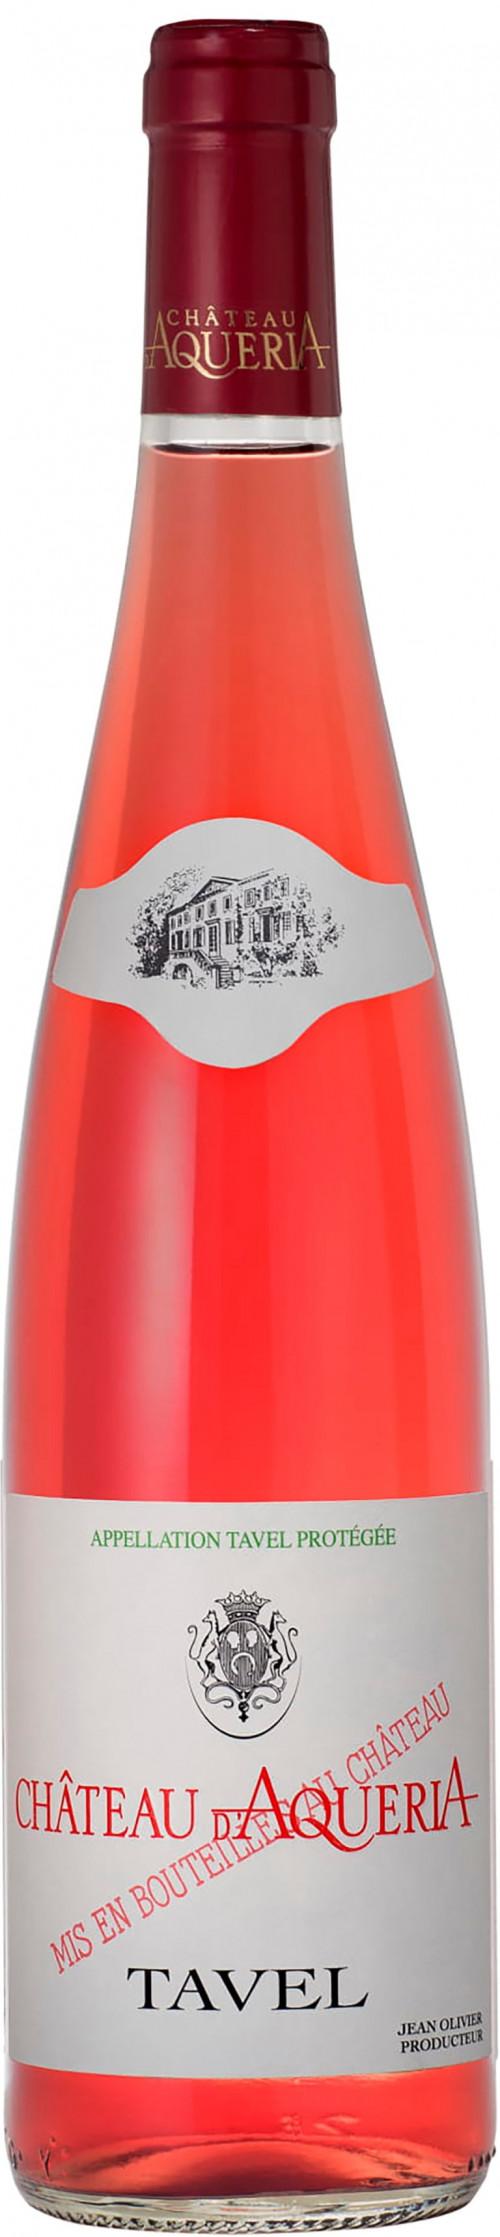 2020 Chateau D'aqueria Tavel Rose 750ml